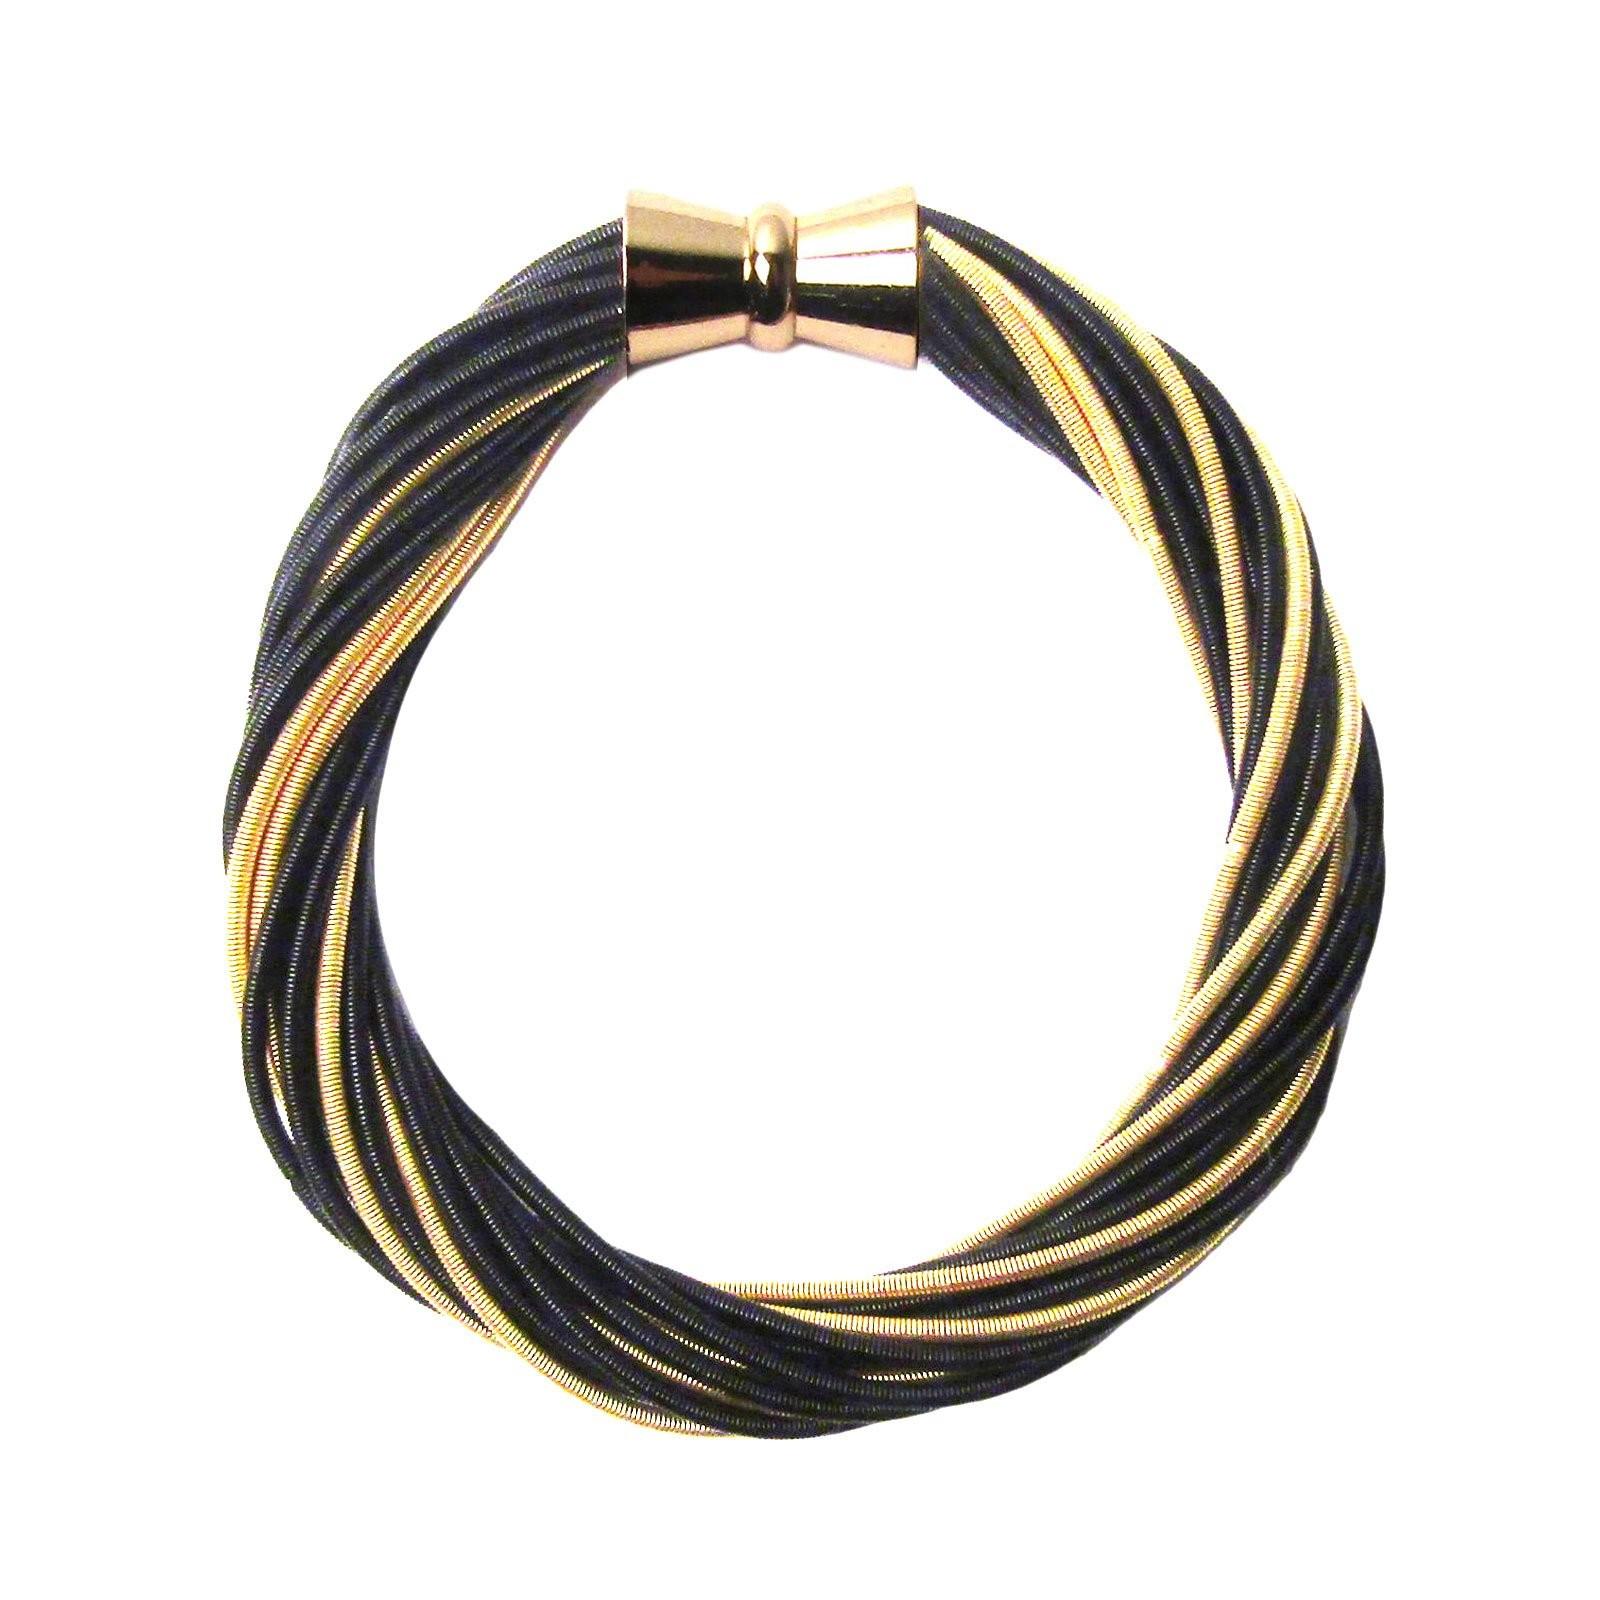 Handcrafted Gold Black Multi Strand Twist Piano Wire Bracelet